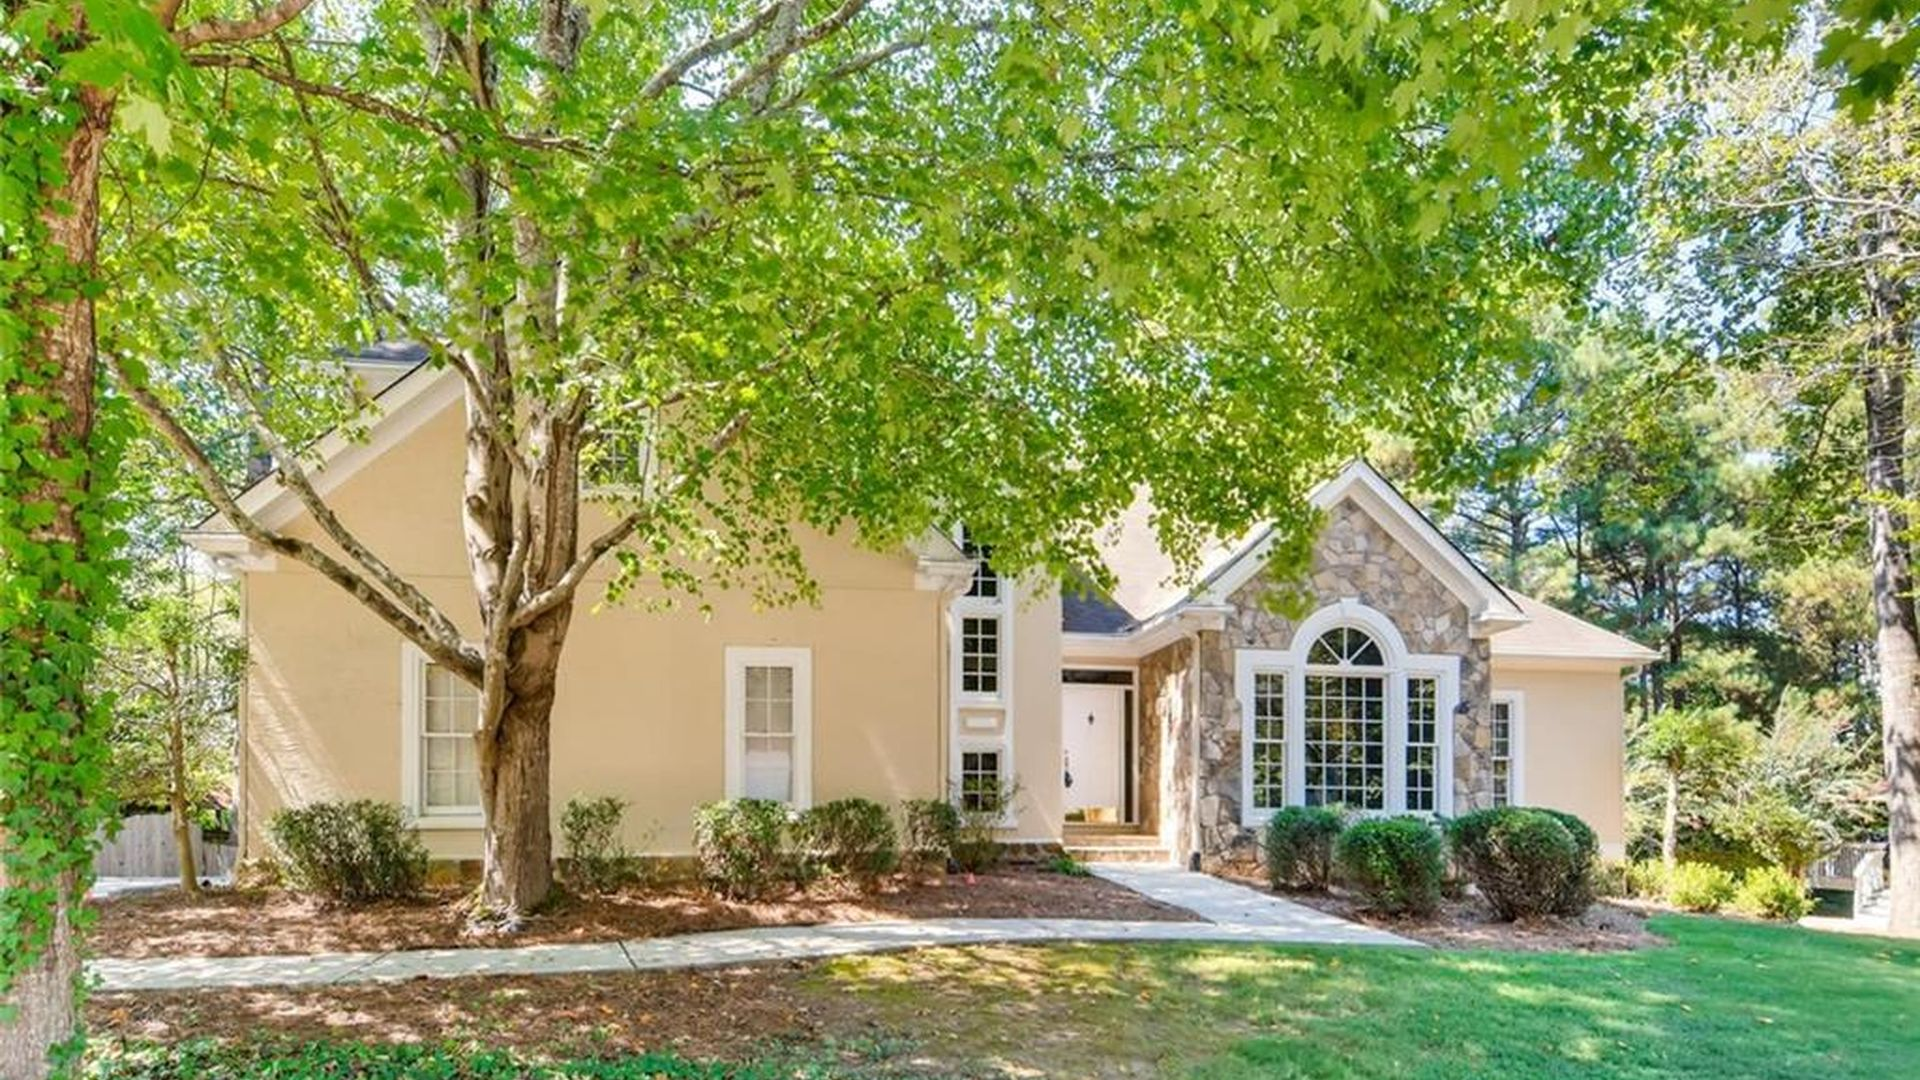 Johns Creek Real Estate - Johns Creek GA Homes For Sale | Zillow